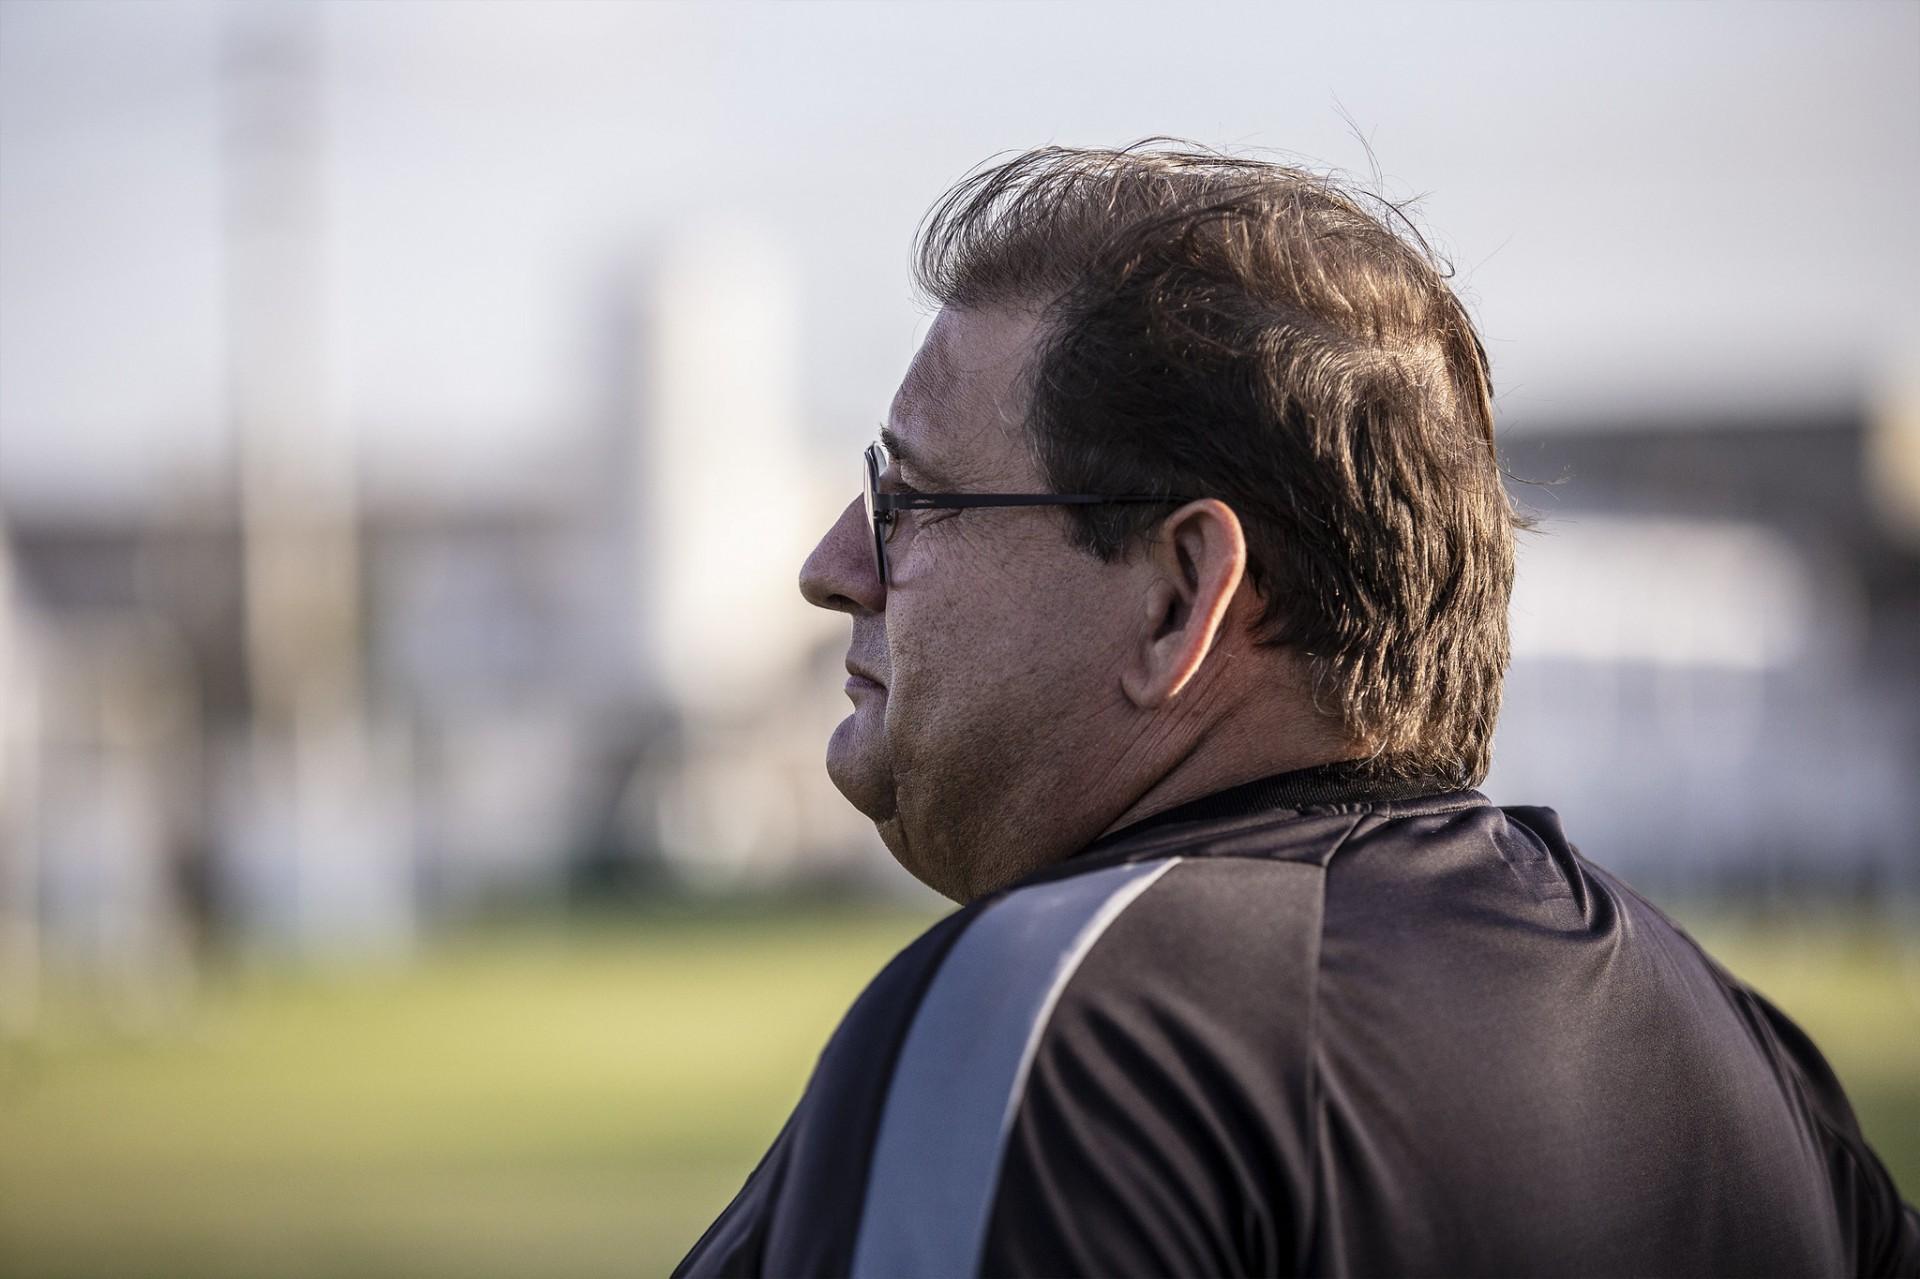 Batismo de fogo! É o Ceará na estreia da Copa Sul-Americana 2021